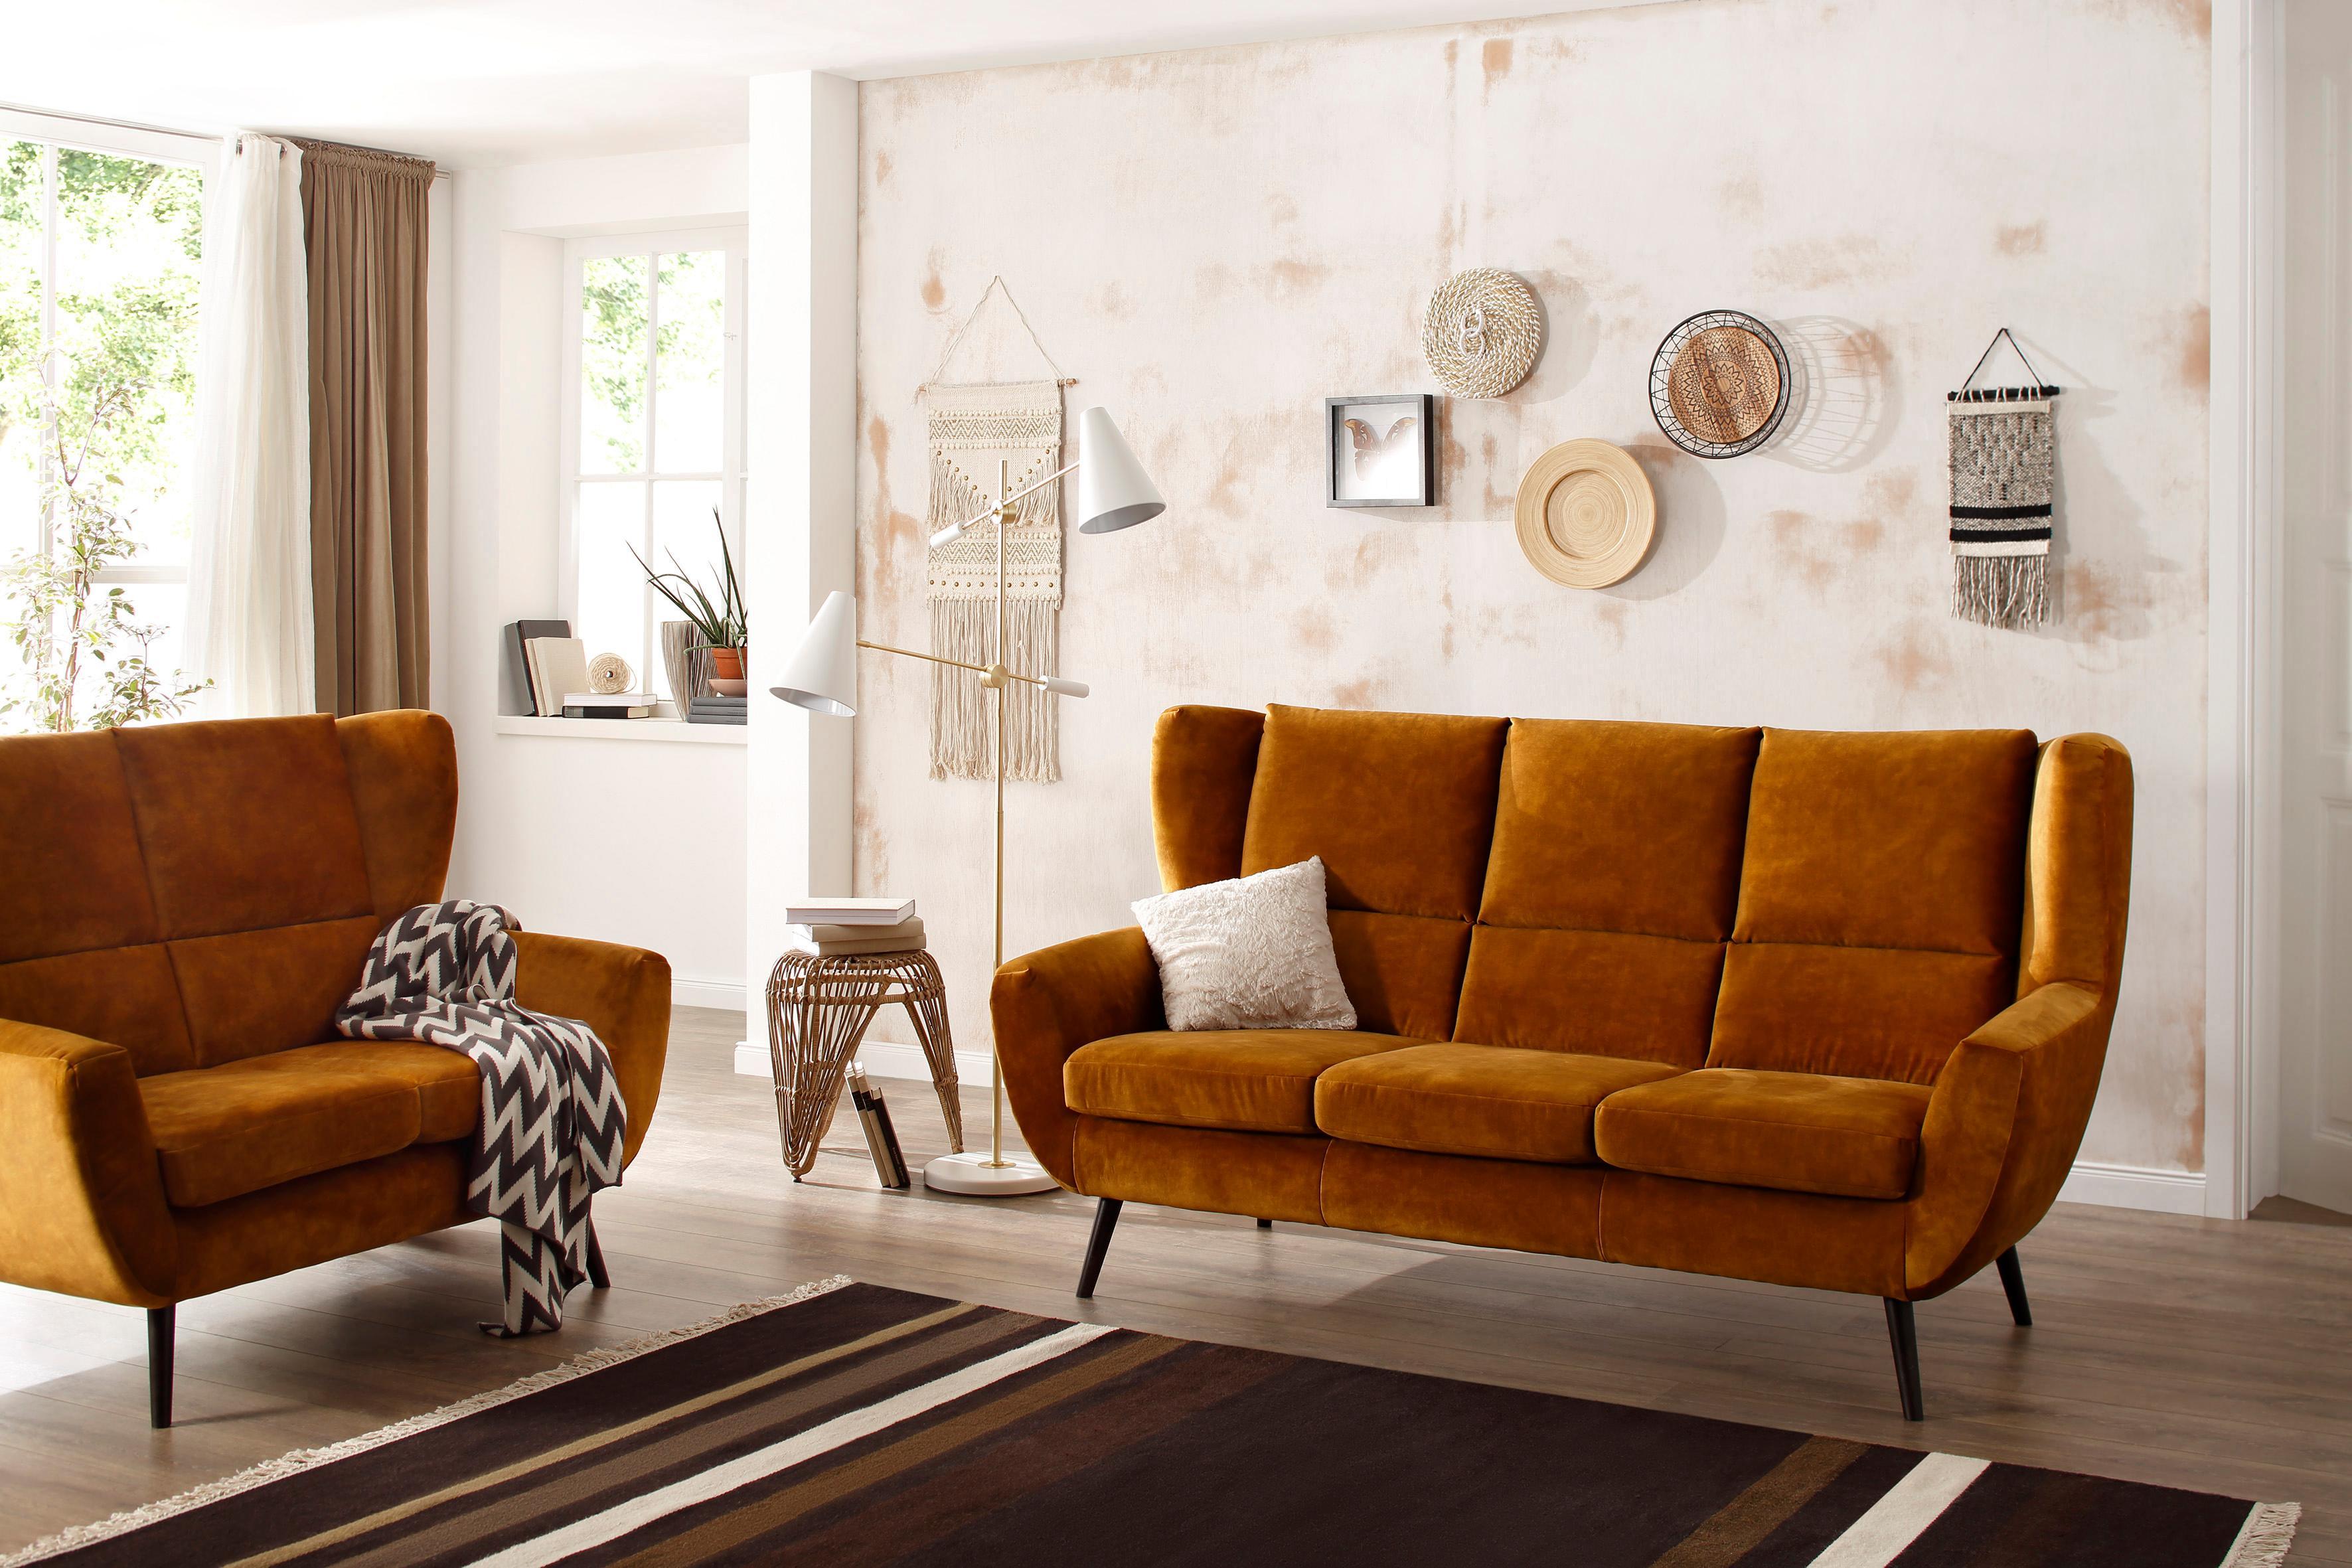 Home affaire 3-Sitzer Forli in Echtleder